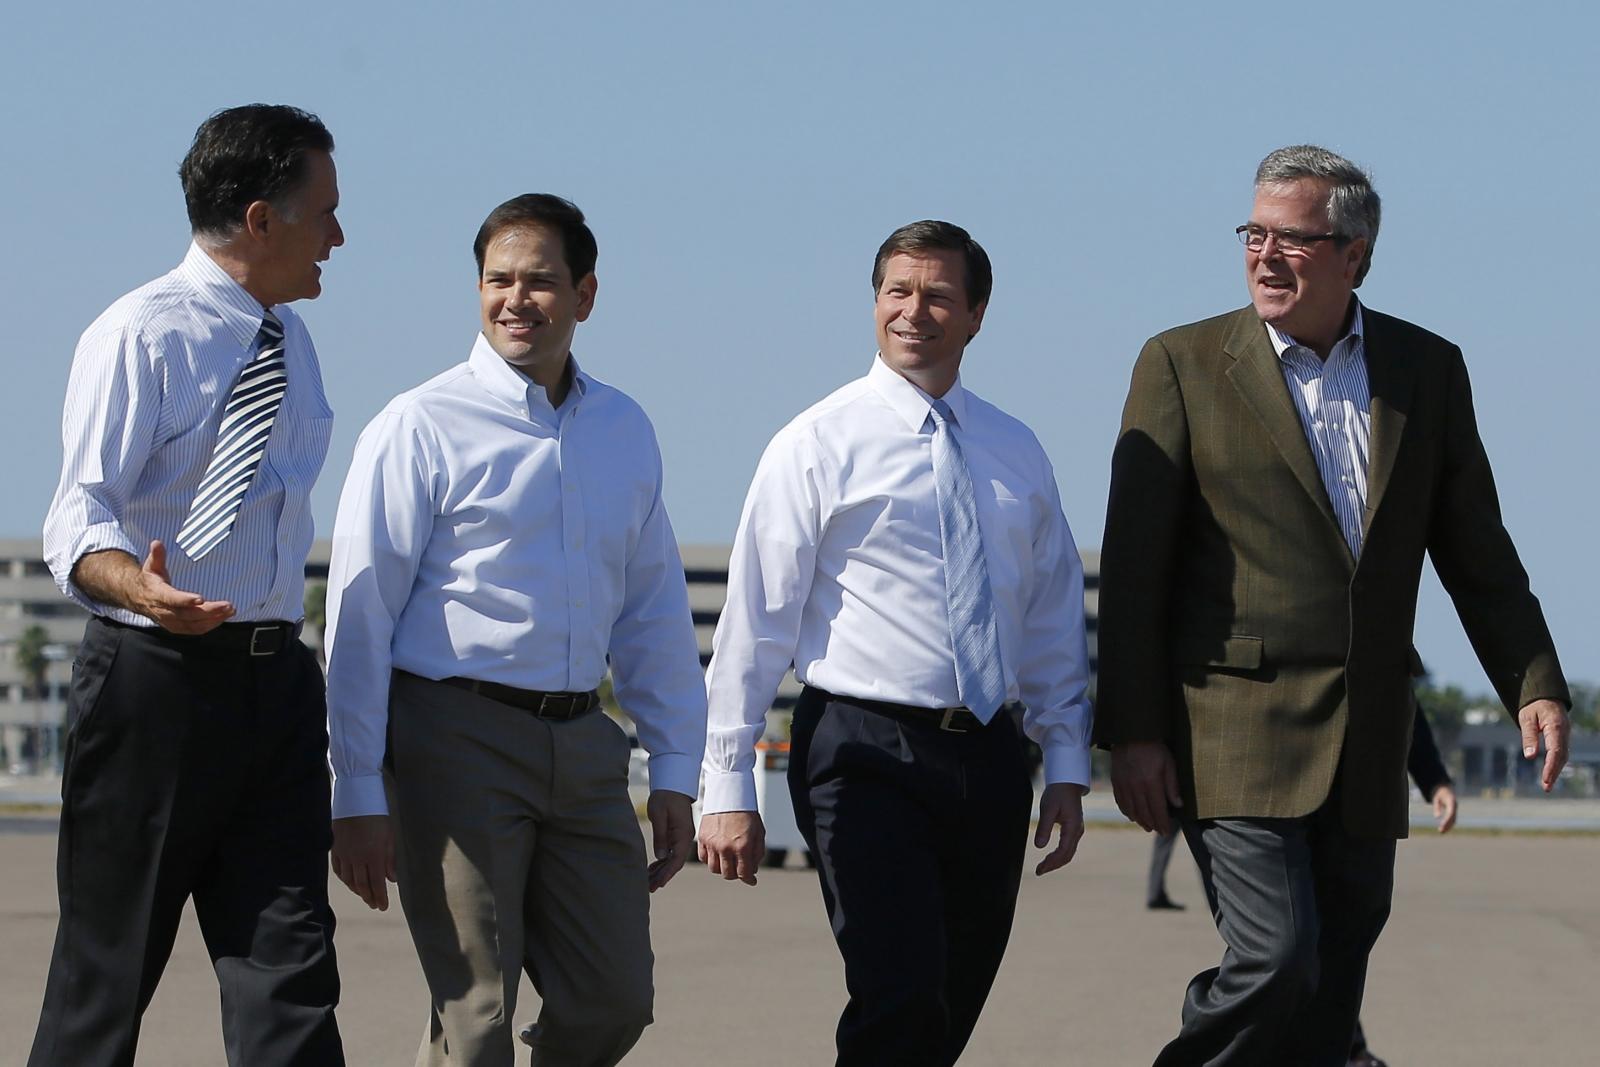 Marco Rubio & Jeb Bush